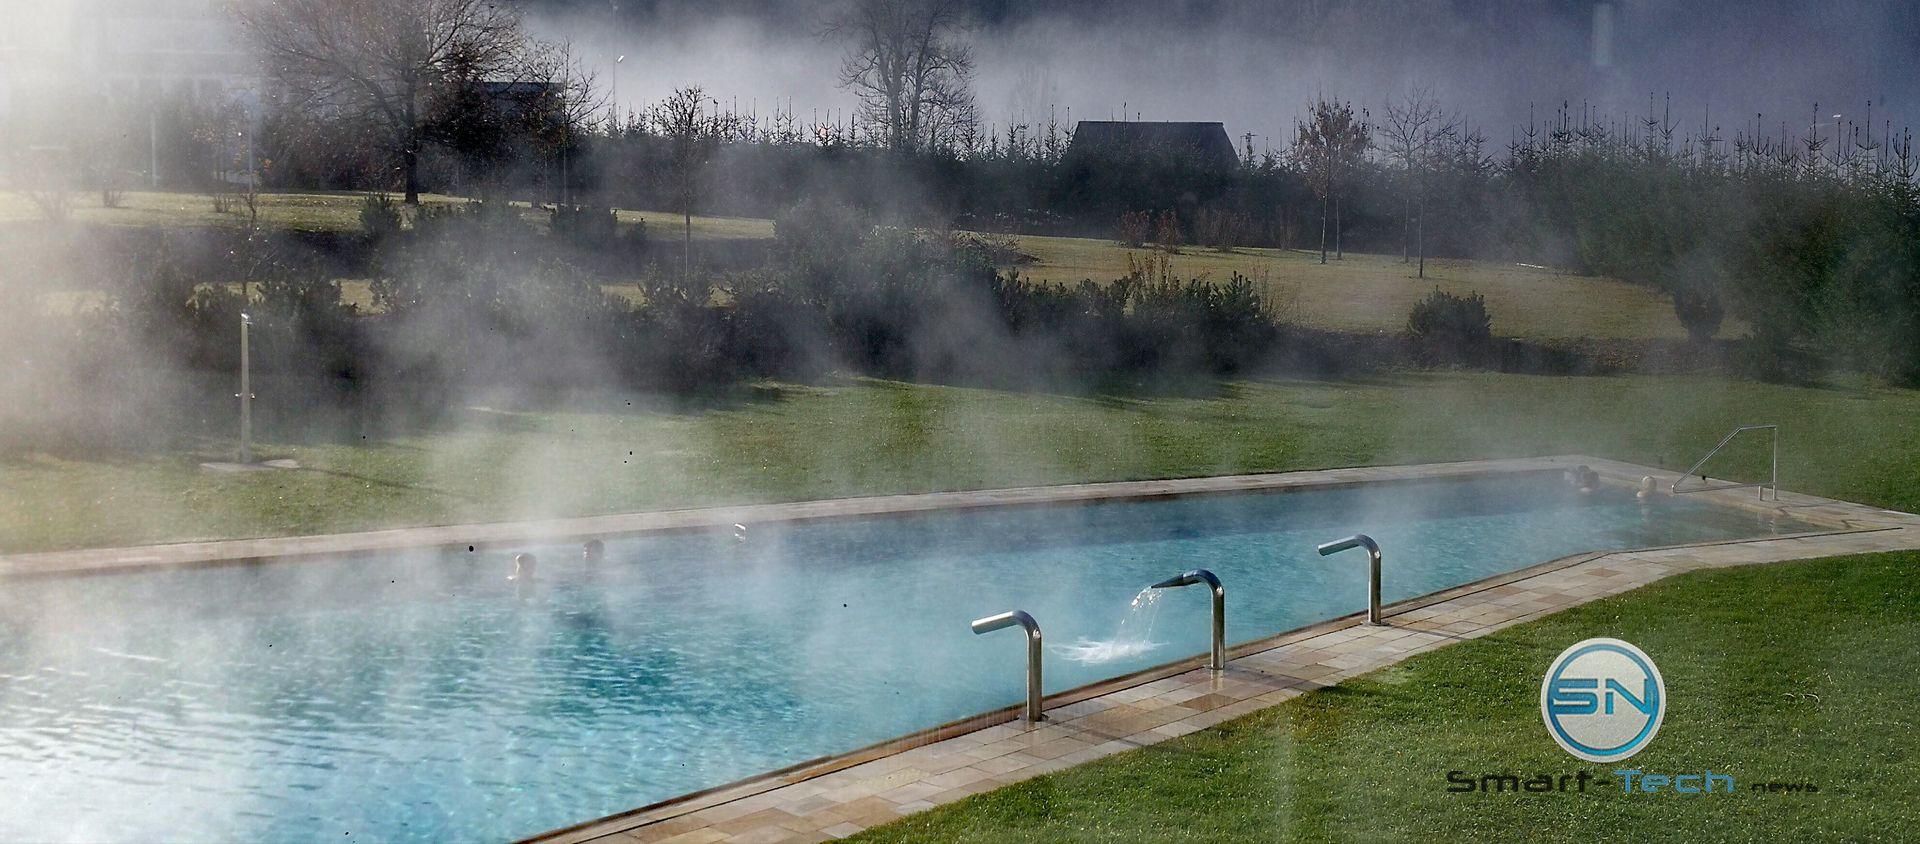 frostiger morgen am Pool - Huawei Mate 9 - SmartTechNews